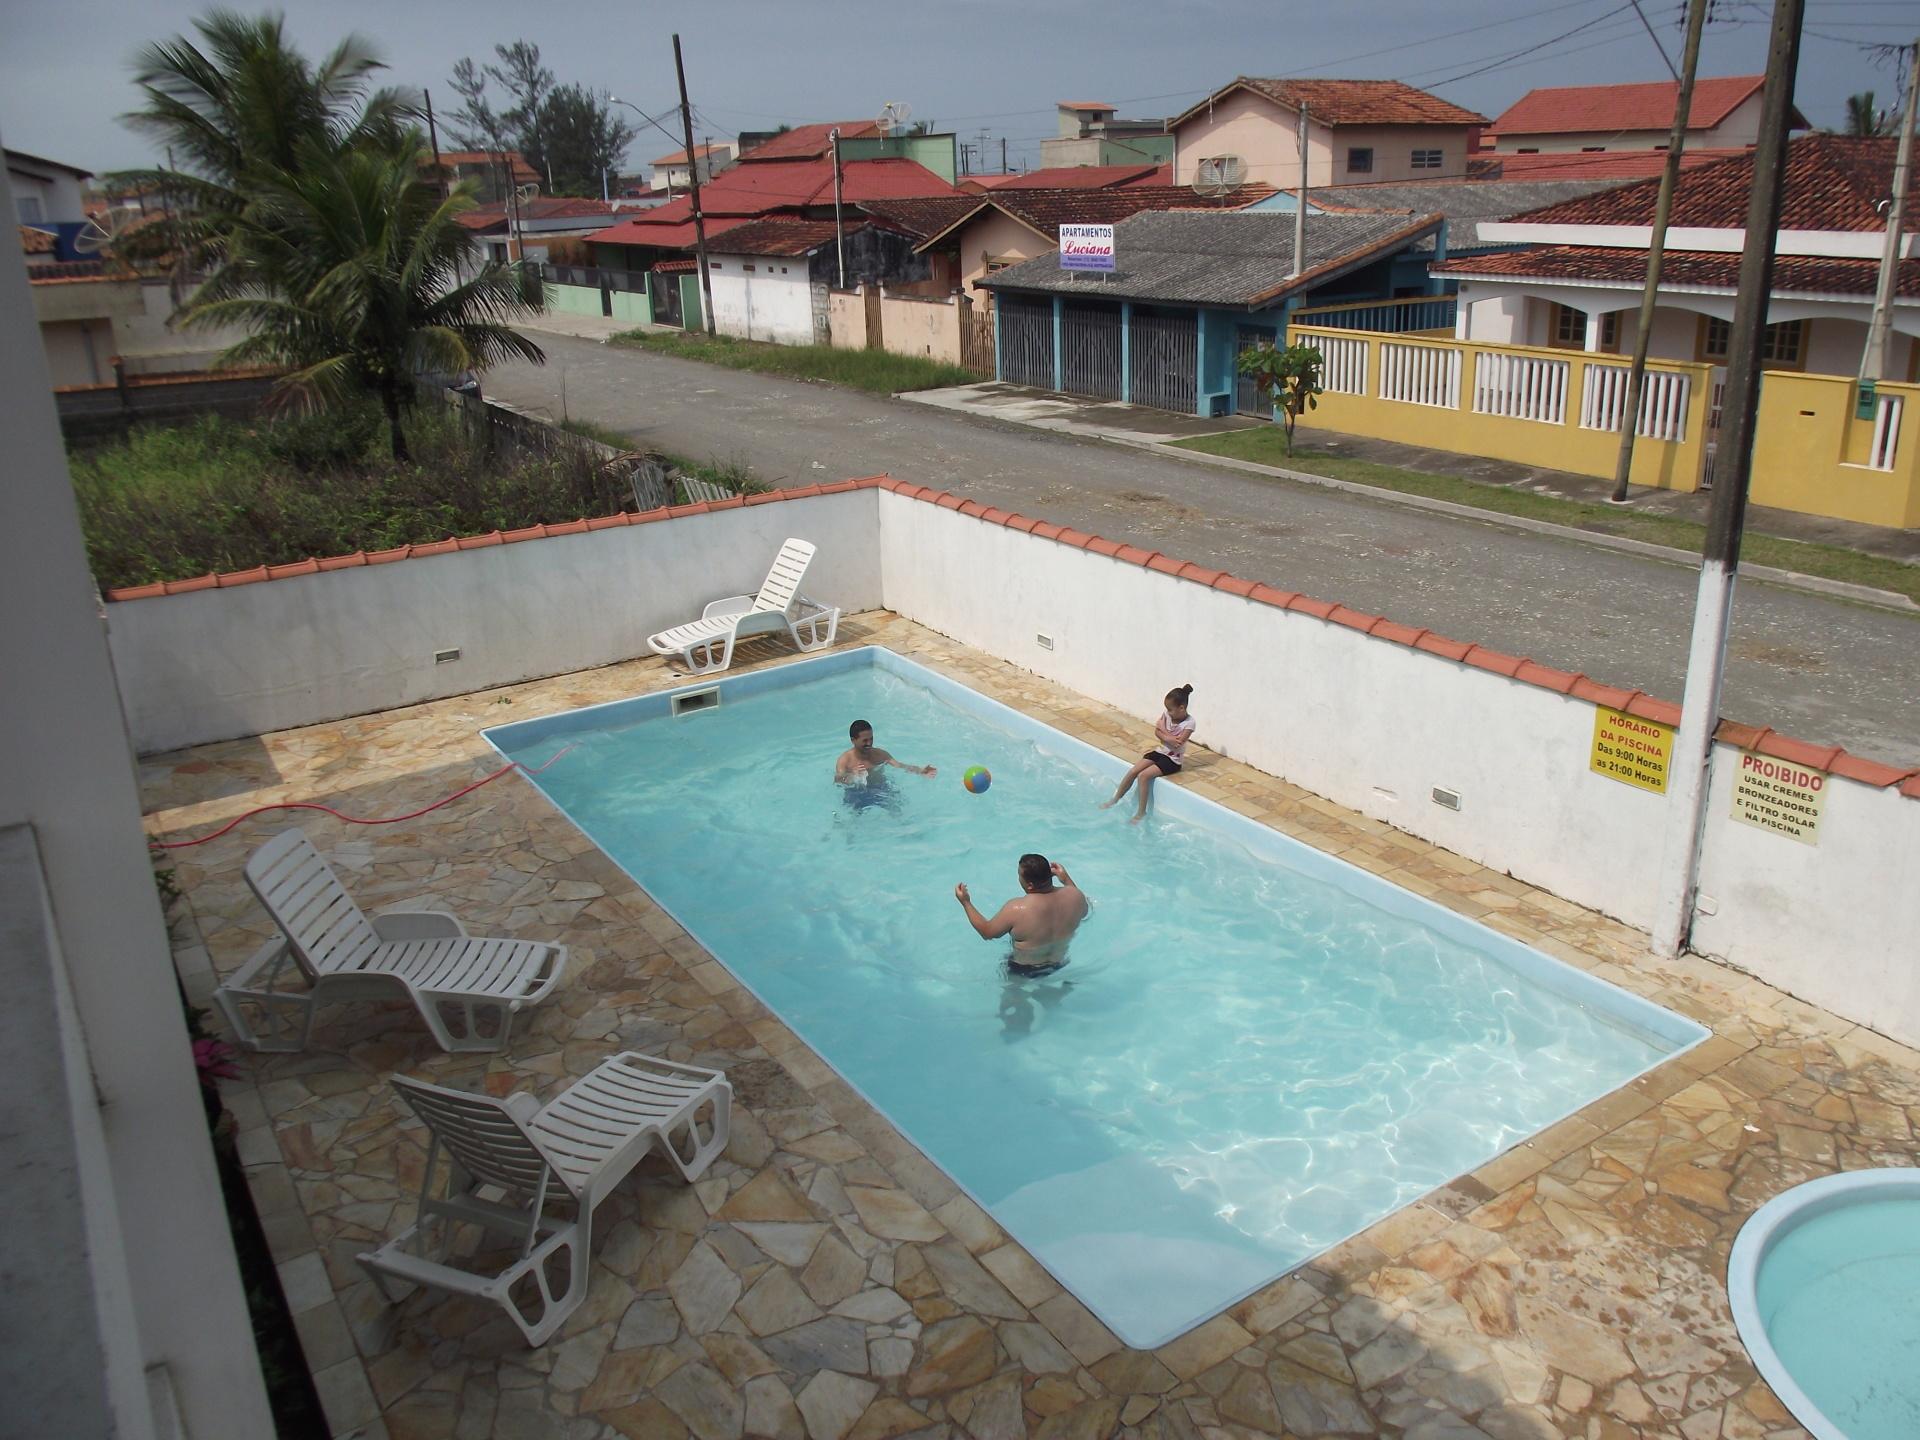 Hotel na Ilha Comprida São Paulo